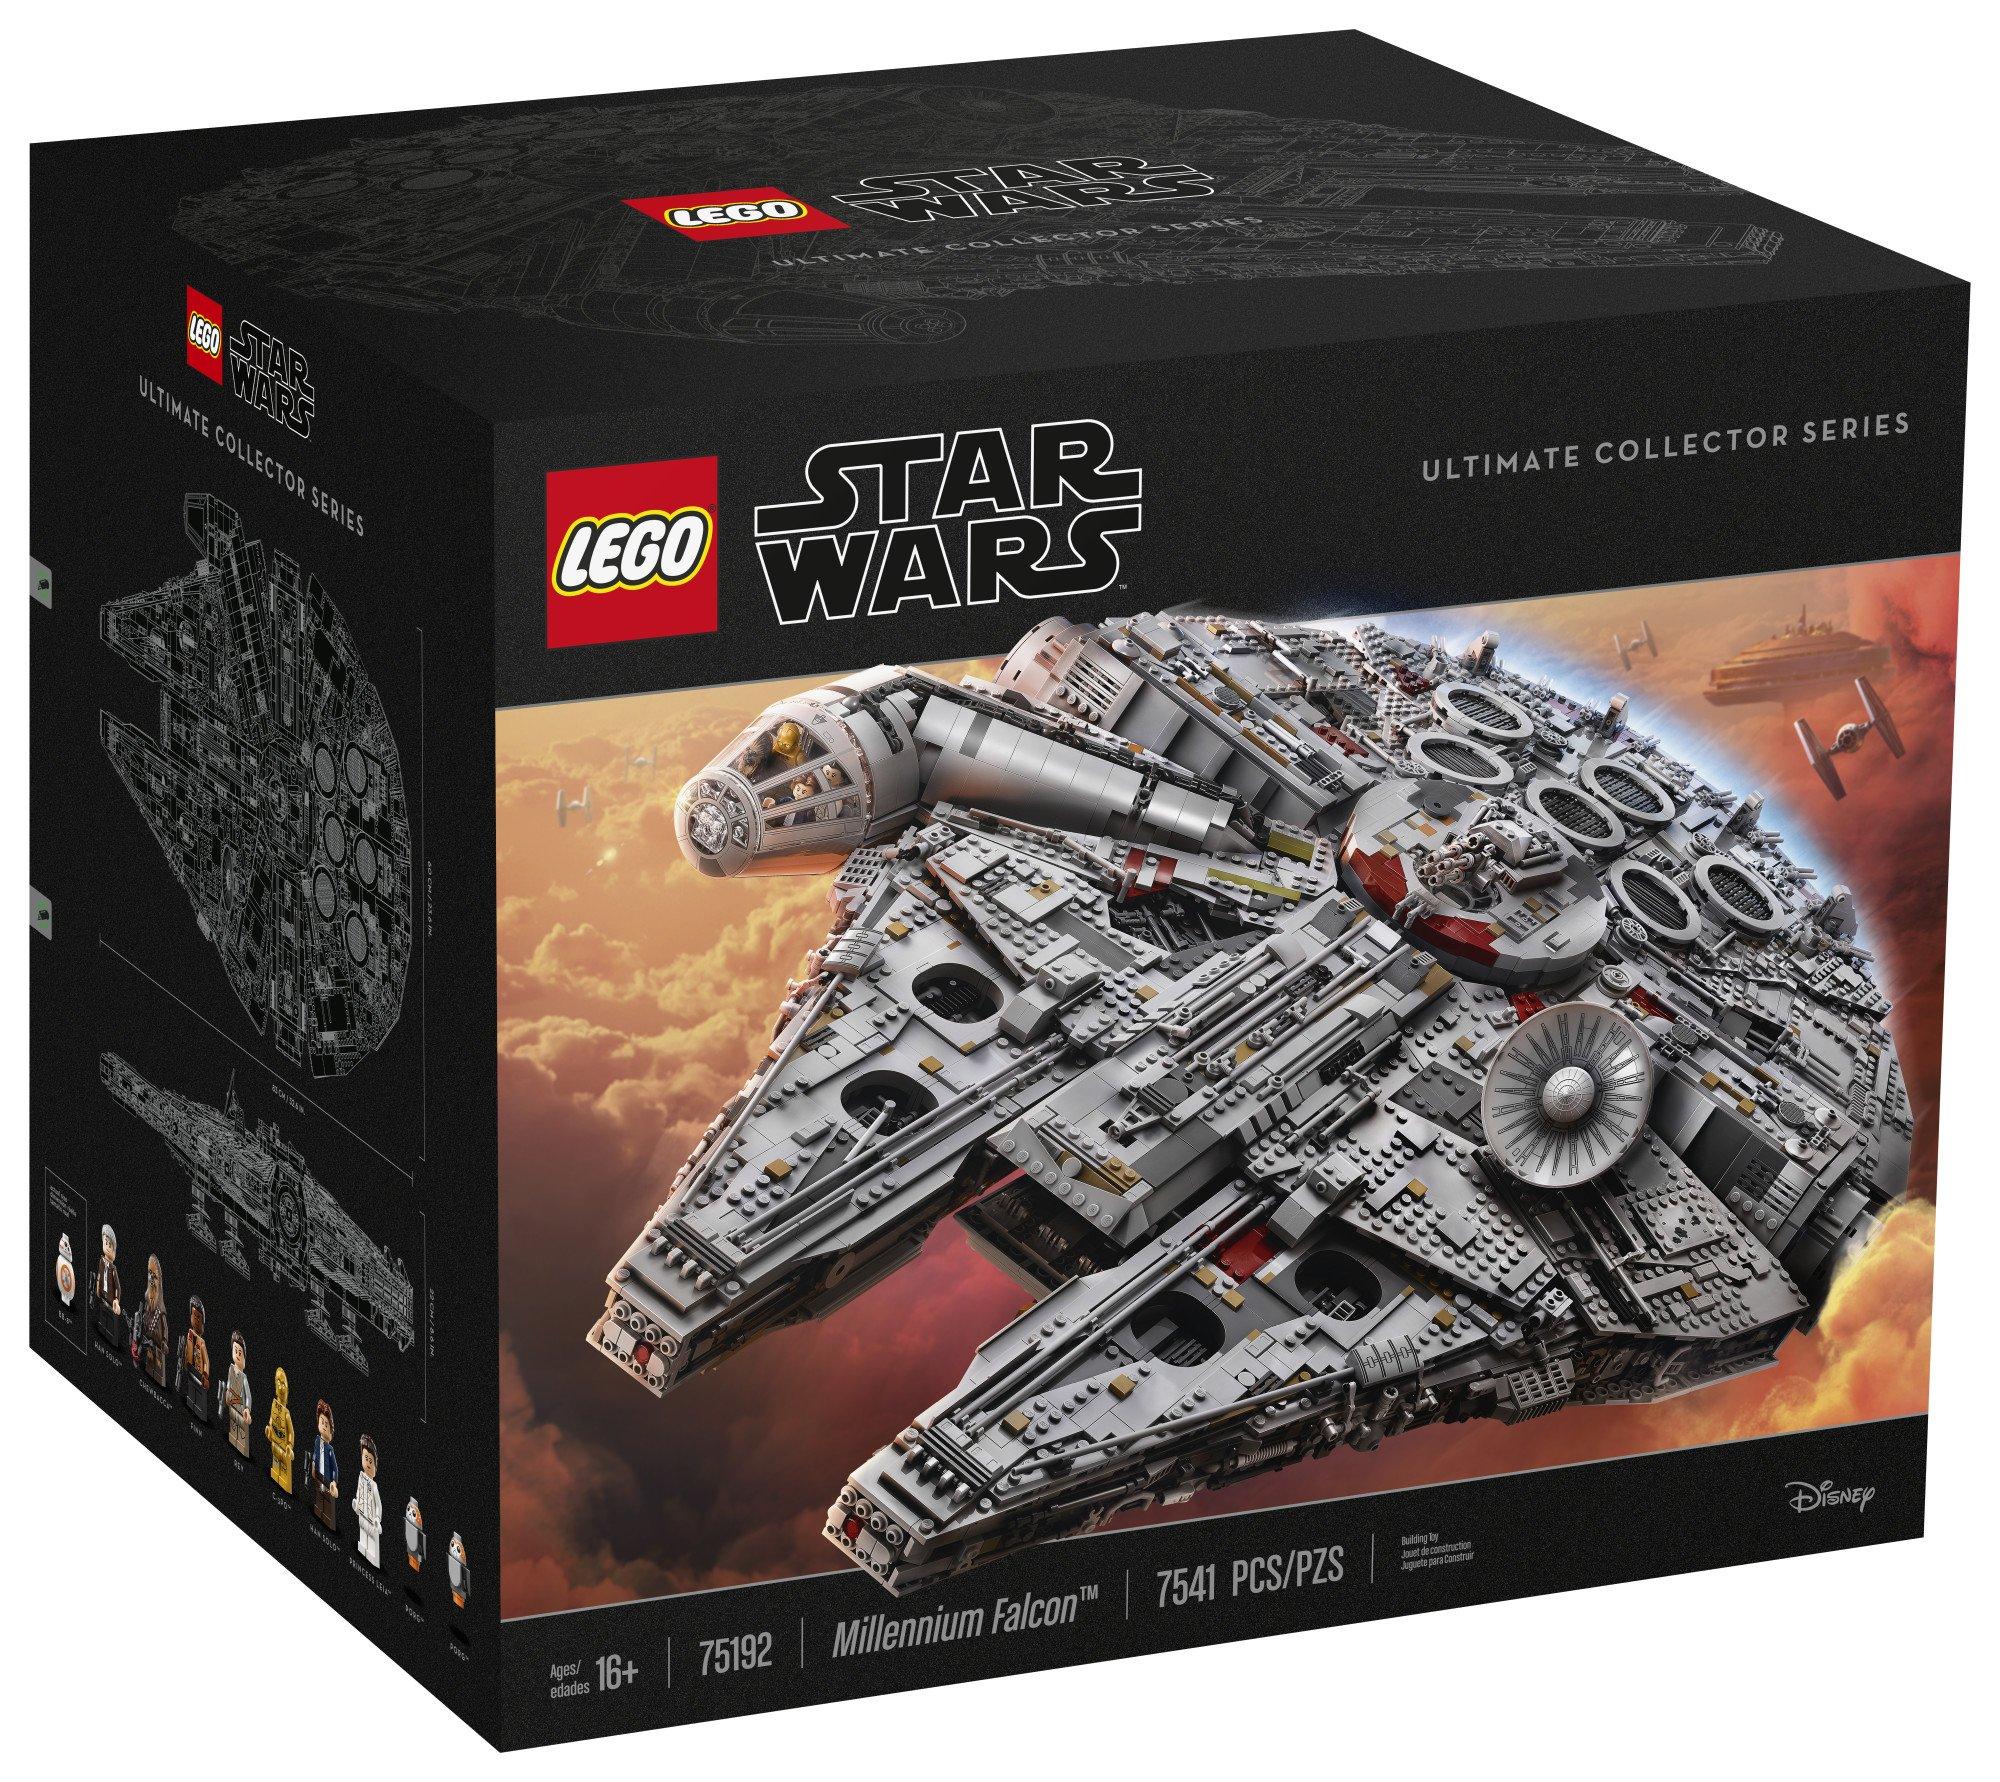 LEGO Star Wars Millennium Falcon 75192 Building Kit (7541 Piece) by LEGO (Image #4)